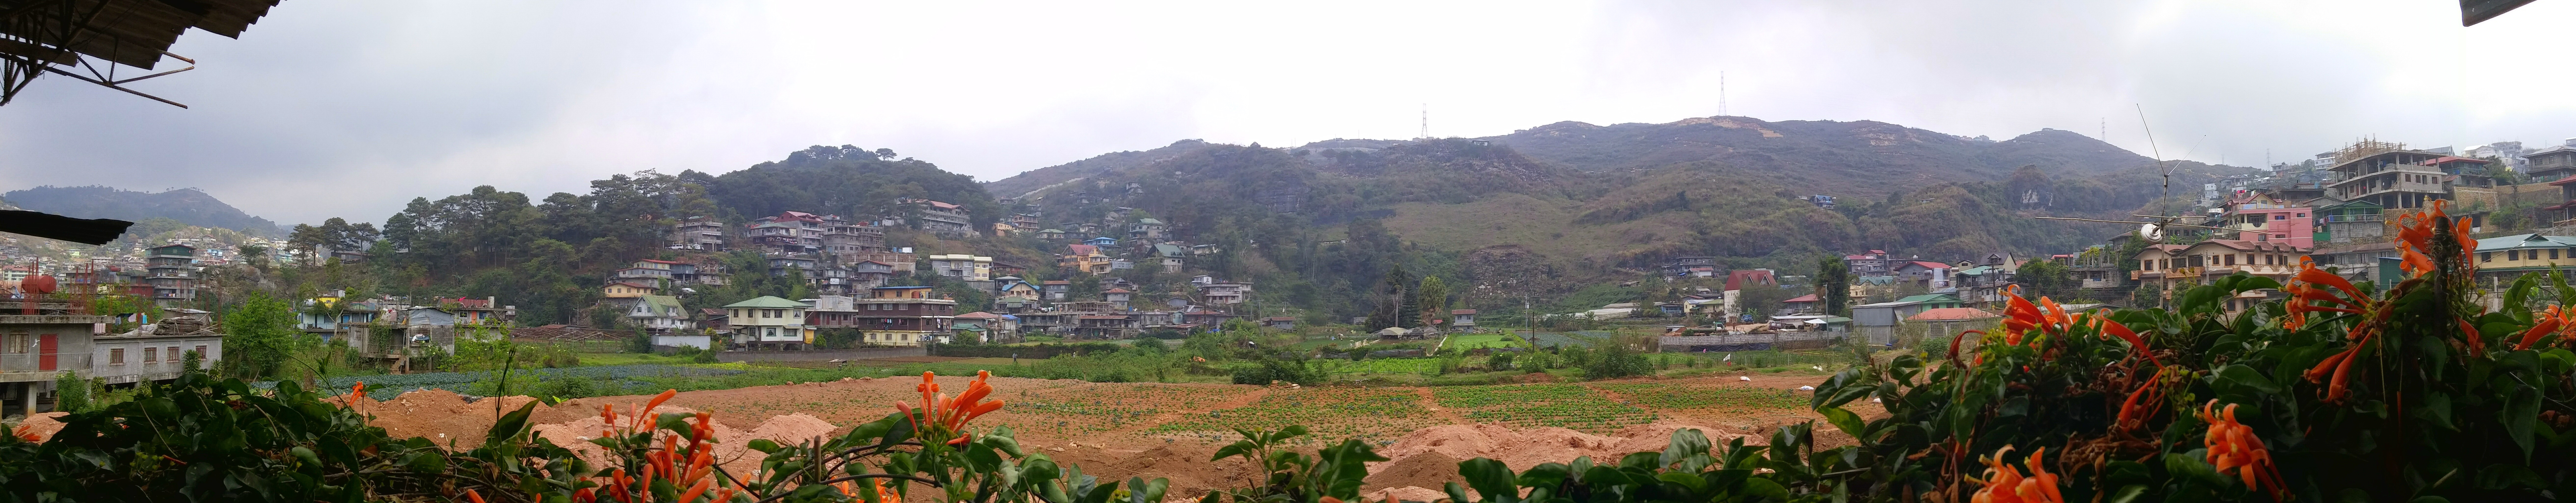 Panoramic view of La Trinidad